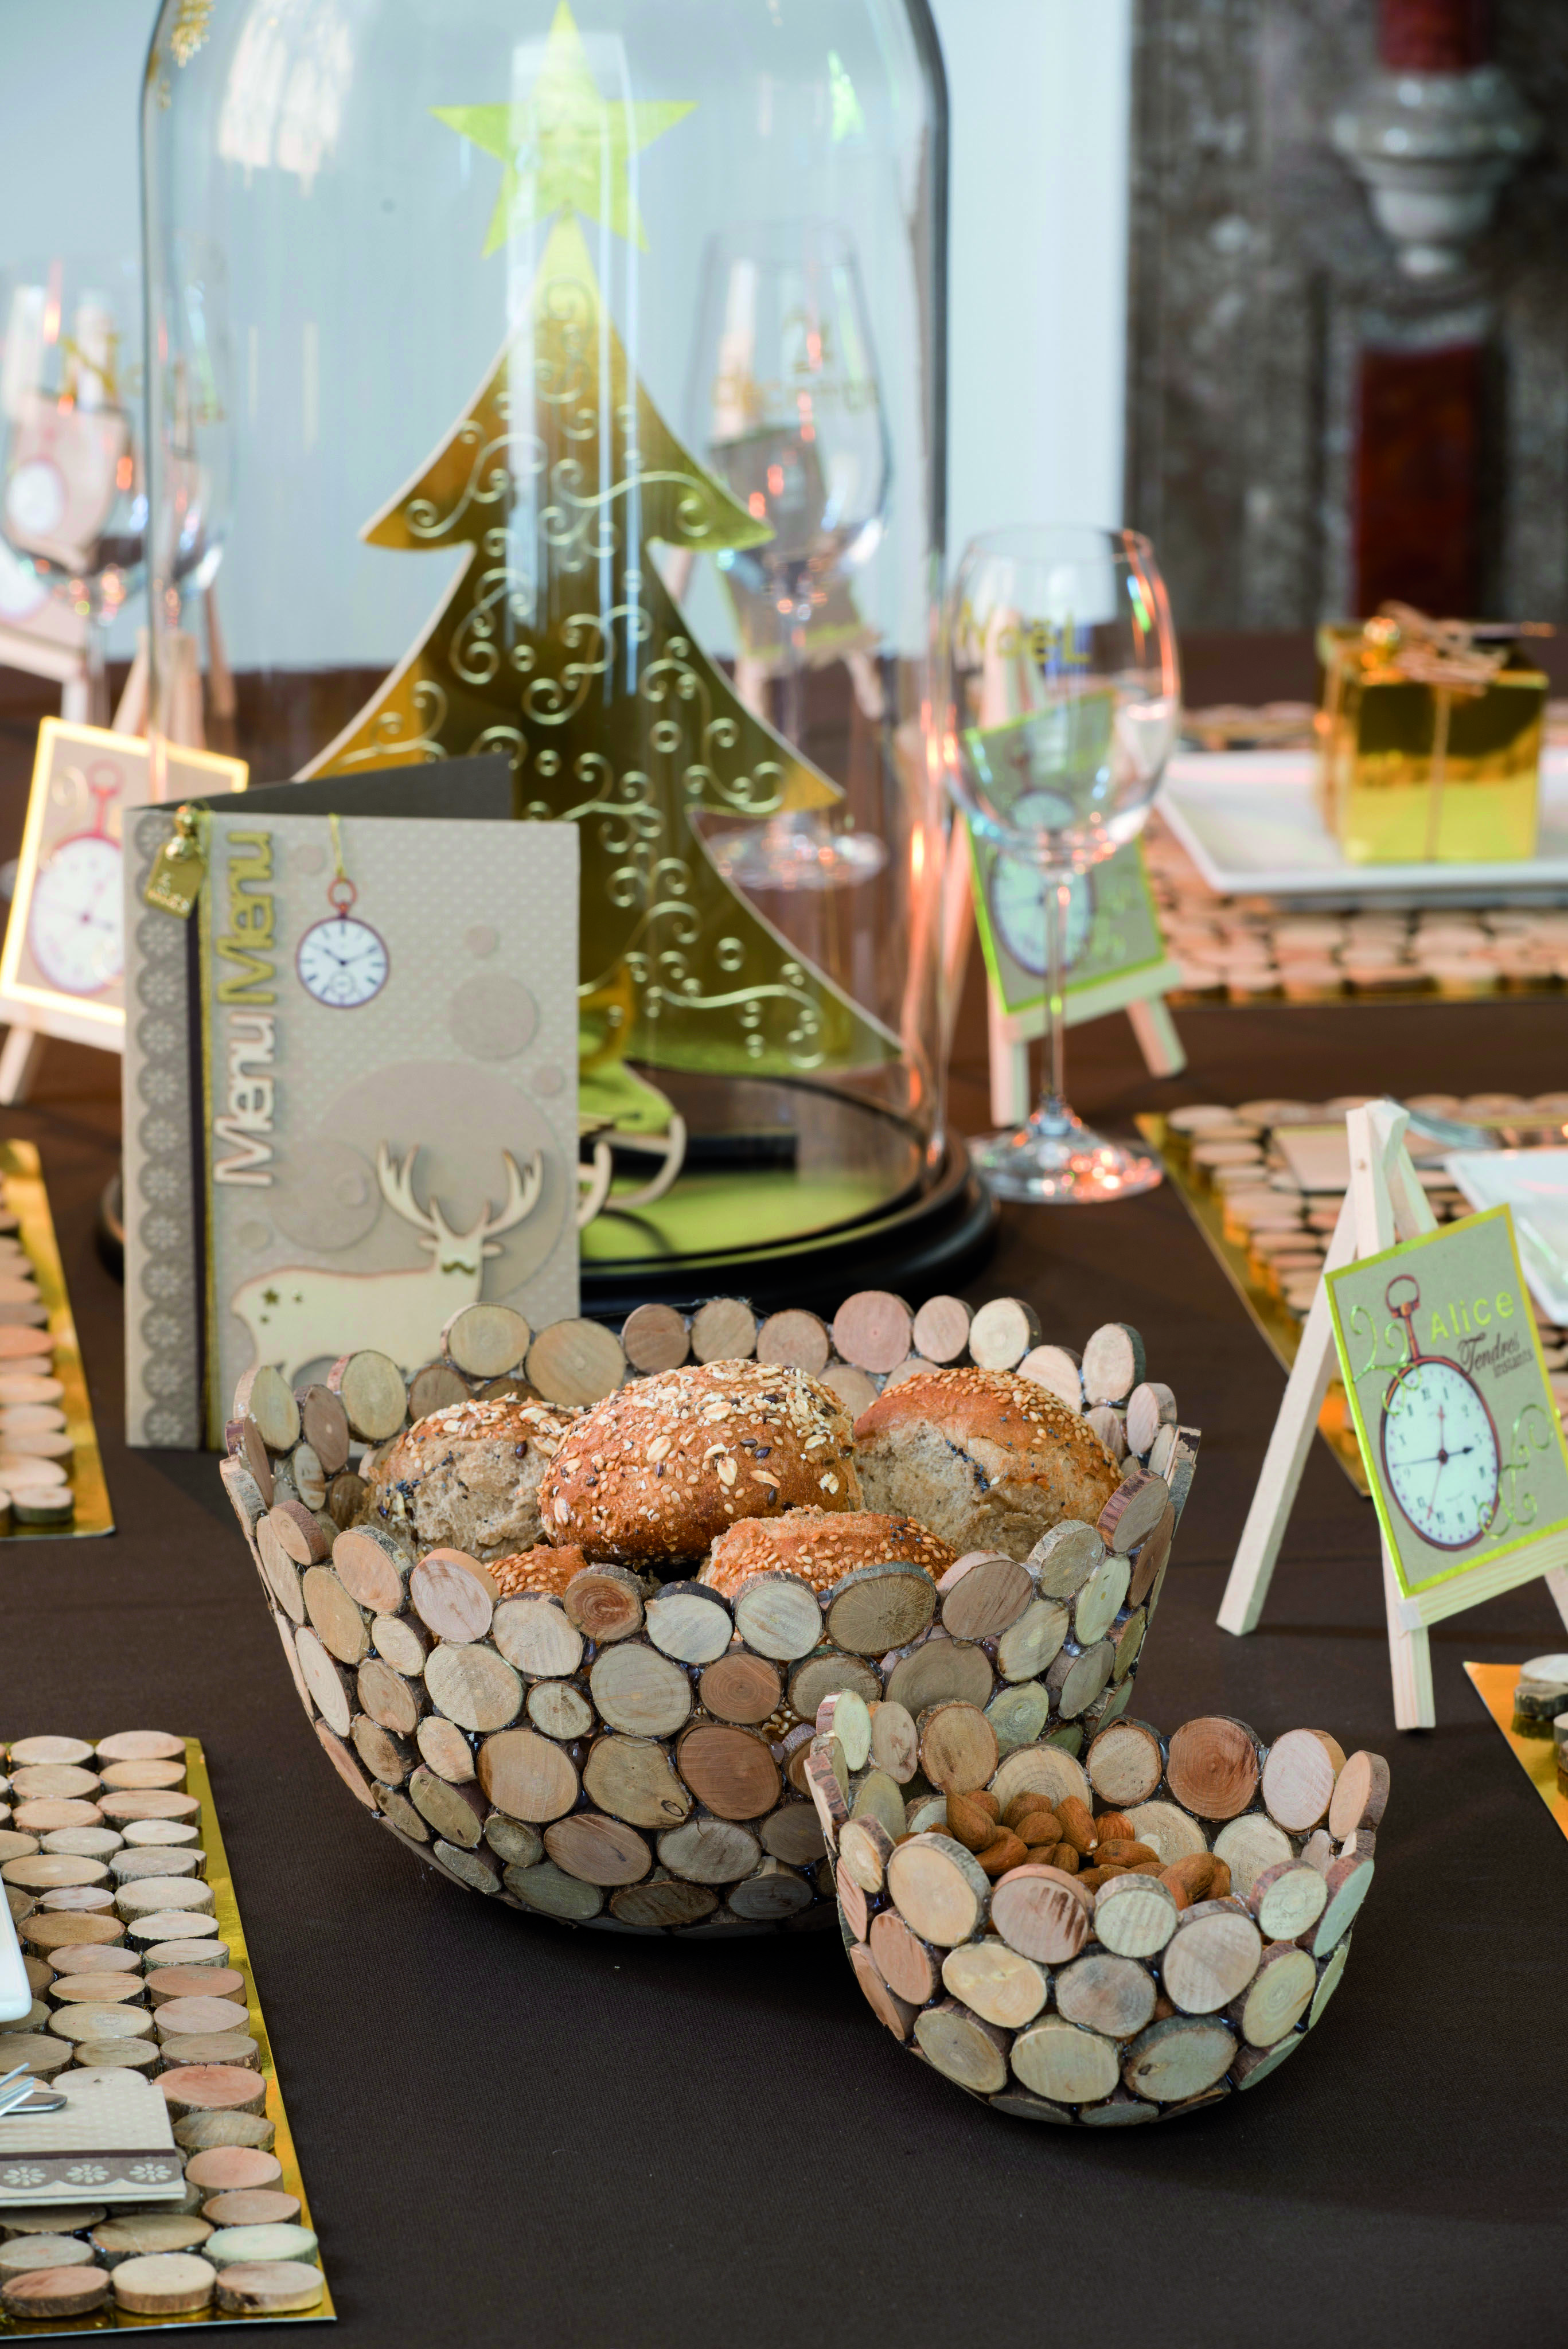 #976734 Décoration De Table En Bois NOEL En Mode Naturel  6225 Décoration De Table Noel En Bois 2734x4096 px @ aertt.com